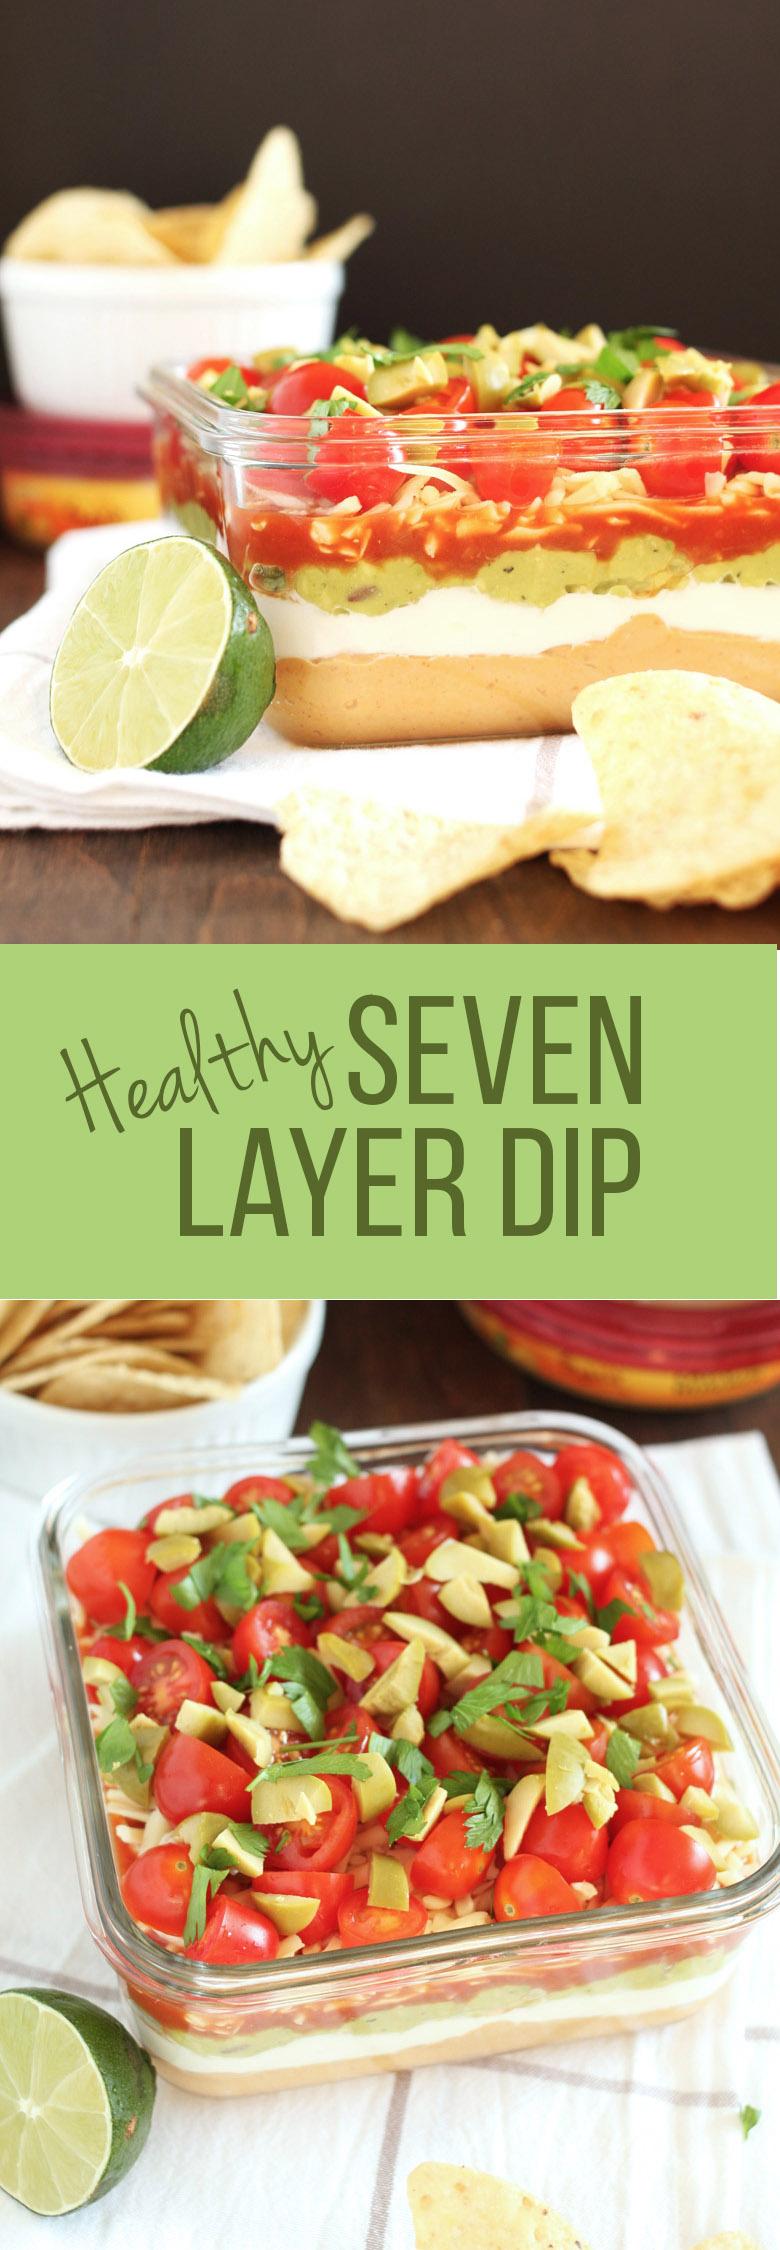 Healthy Seven Layer Dip // @24carrotlife #healthy #sponsored #sabra